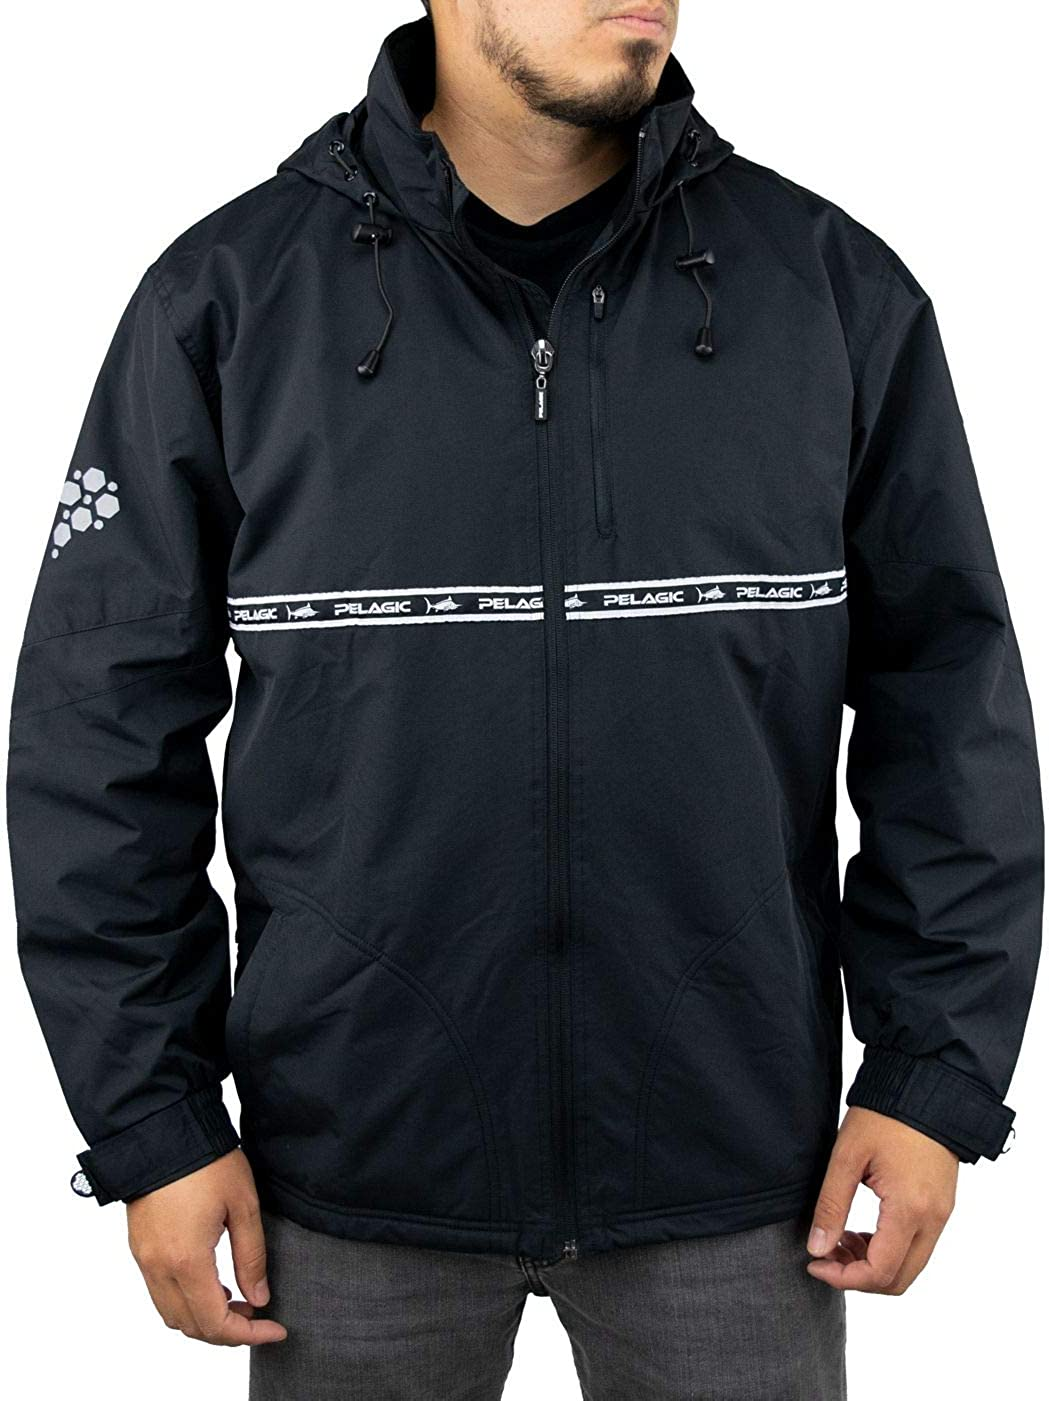 PELAGIC Mens Hurricane Jacket Adjustable Cuffs and Waistband Waterproof Shell